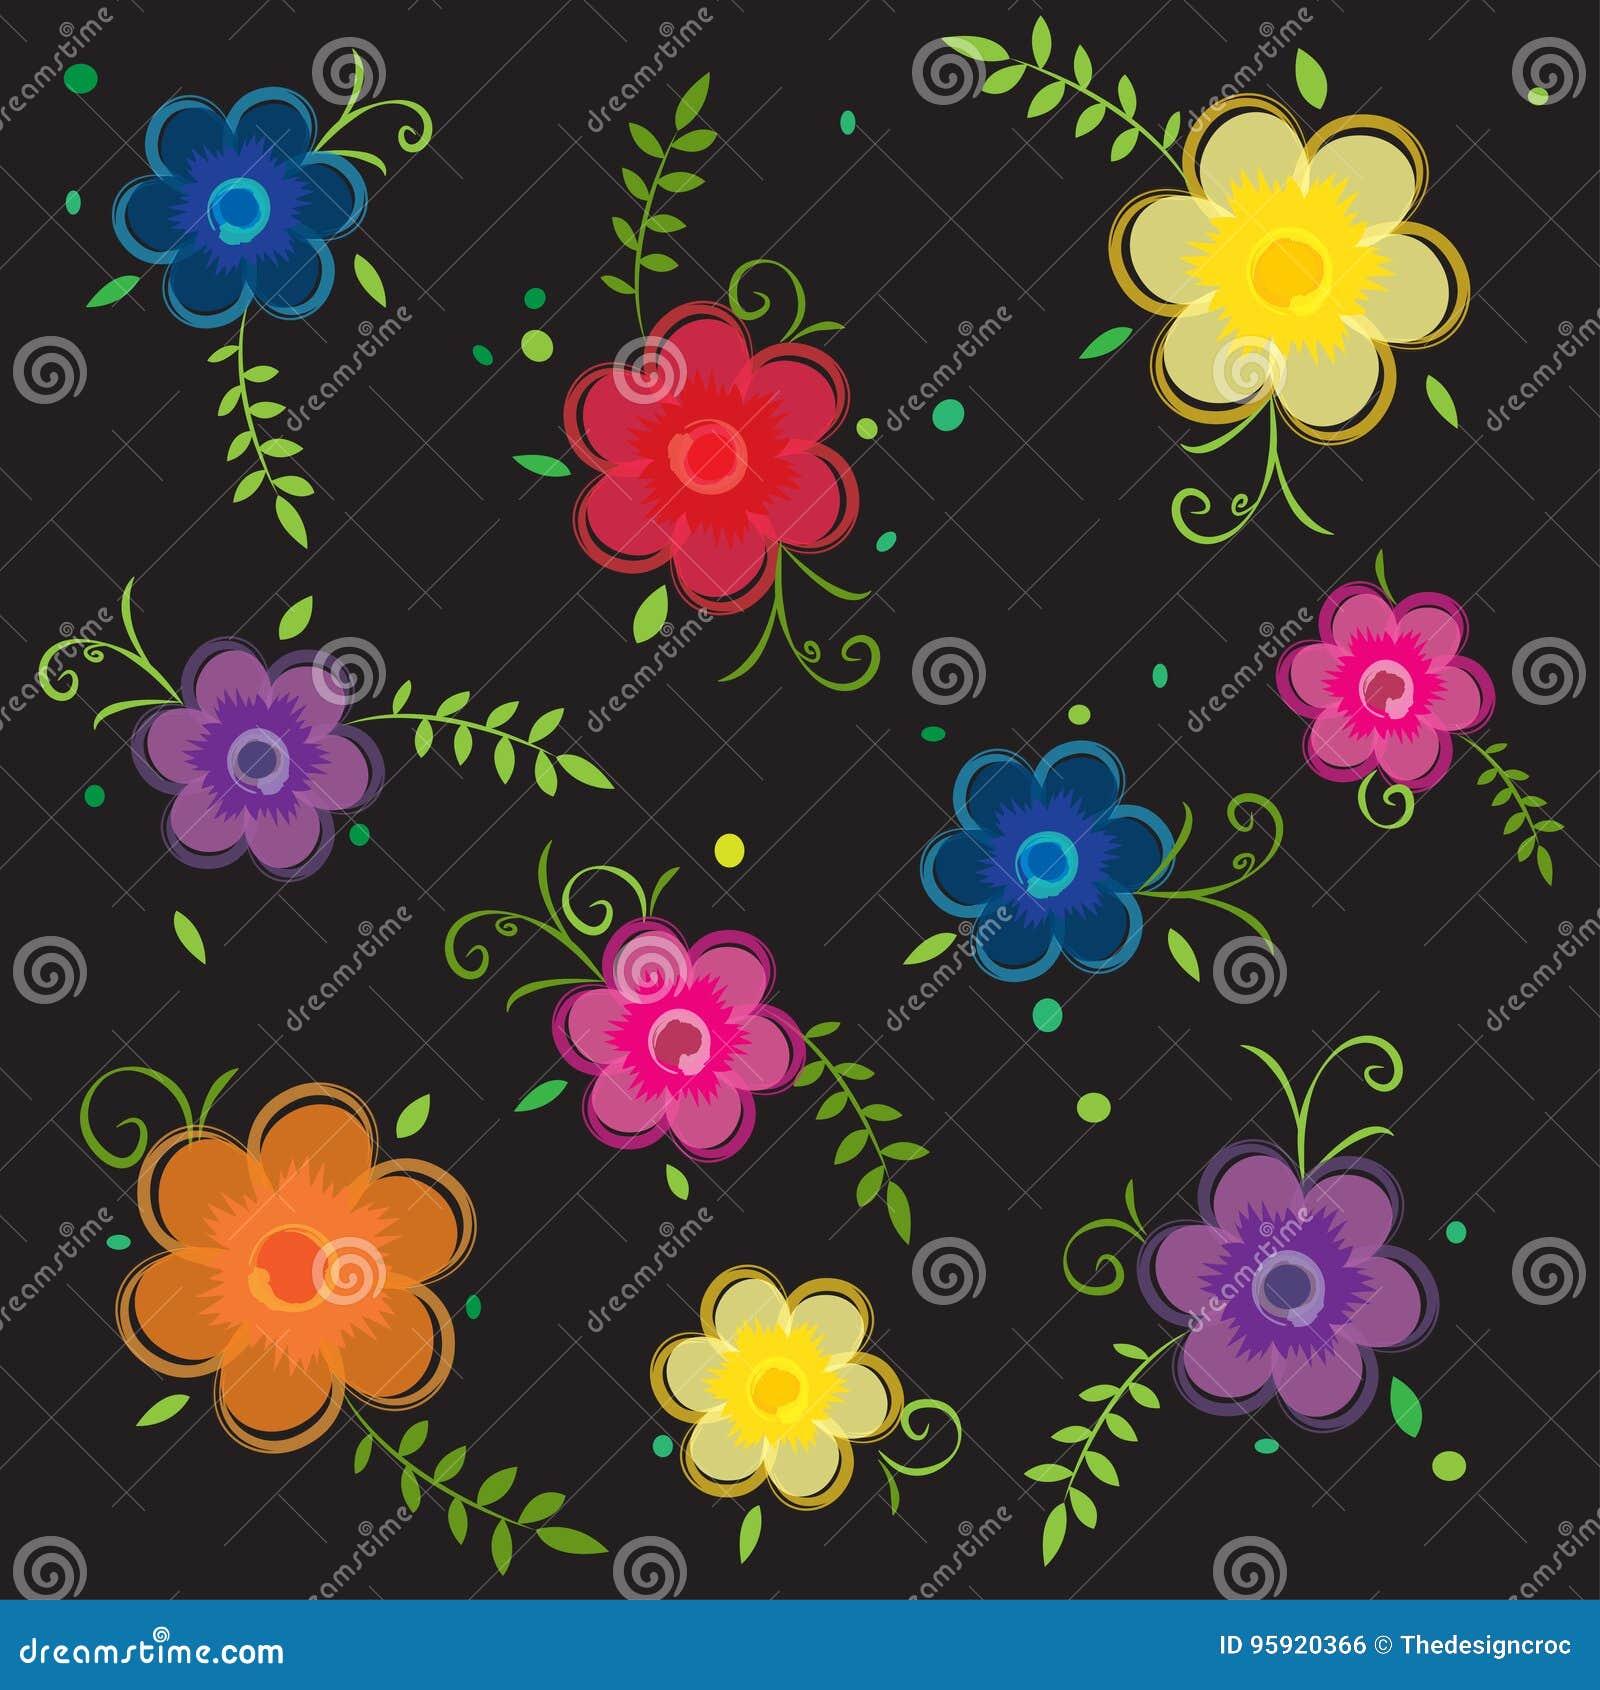 Ornamental Seamless Floral Flower Background Wallpaper Pattern Stock Vector Illustration Of Floral Artwork 95920366